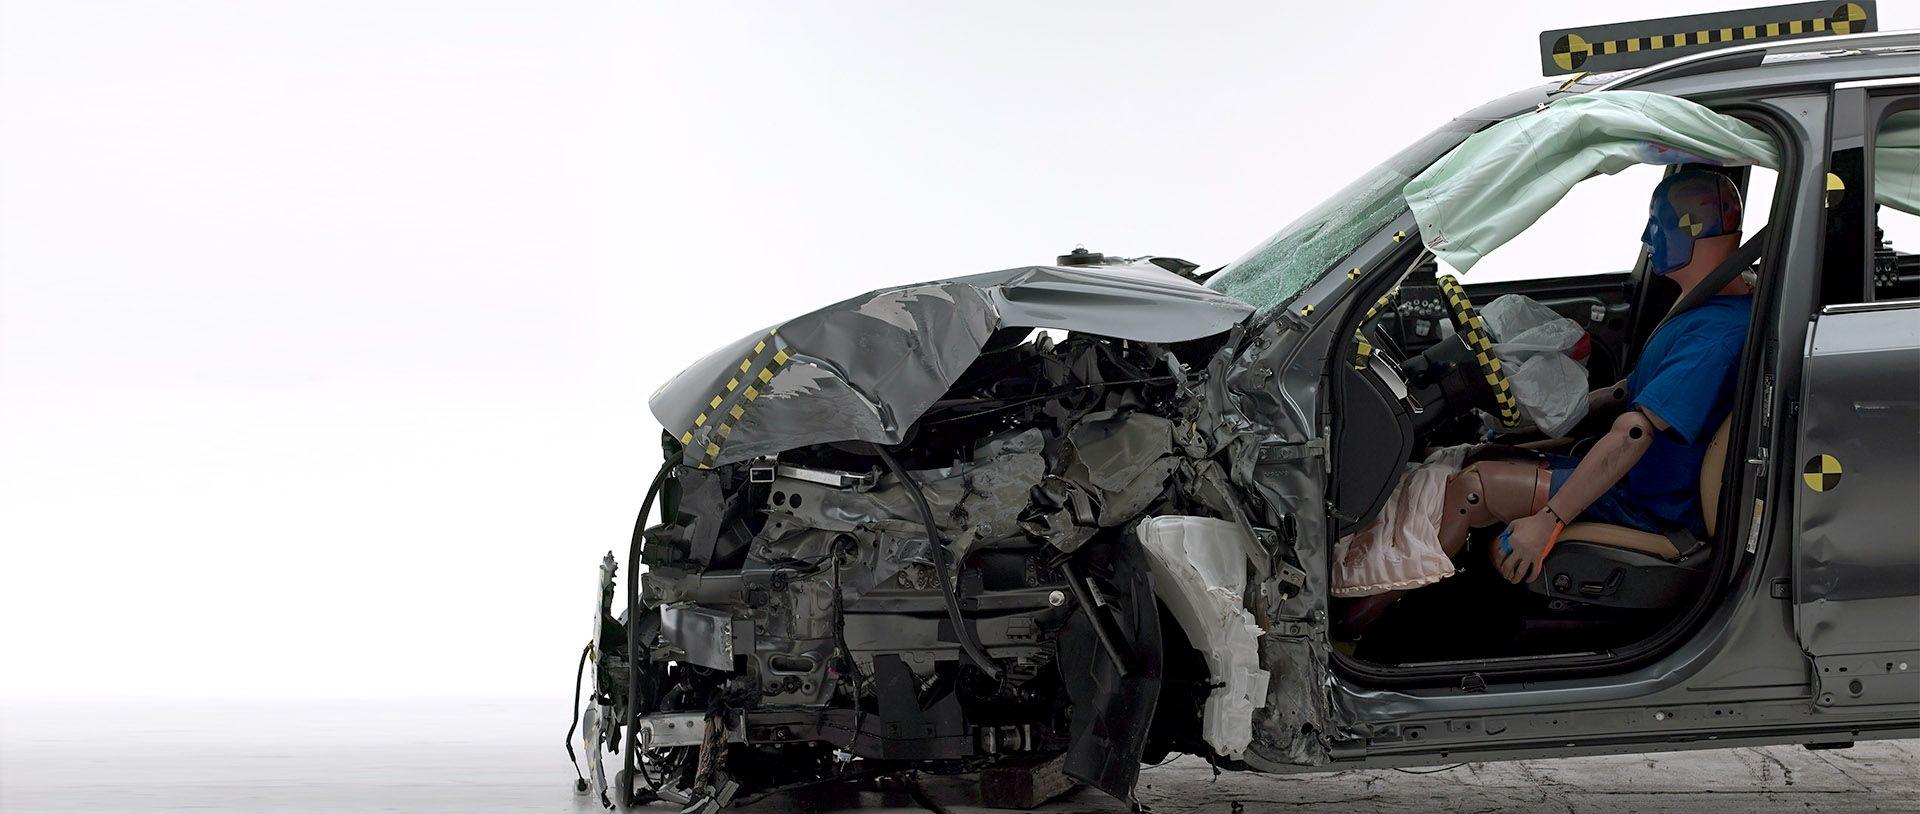 New Nhtsa Car Safety Ratings To Factor Crash Avoidance Tech